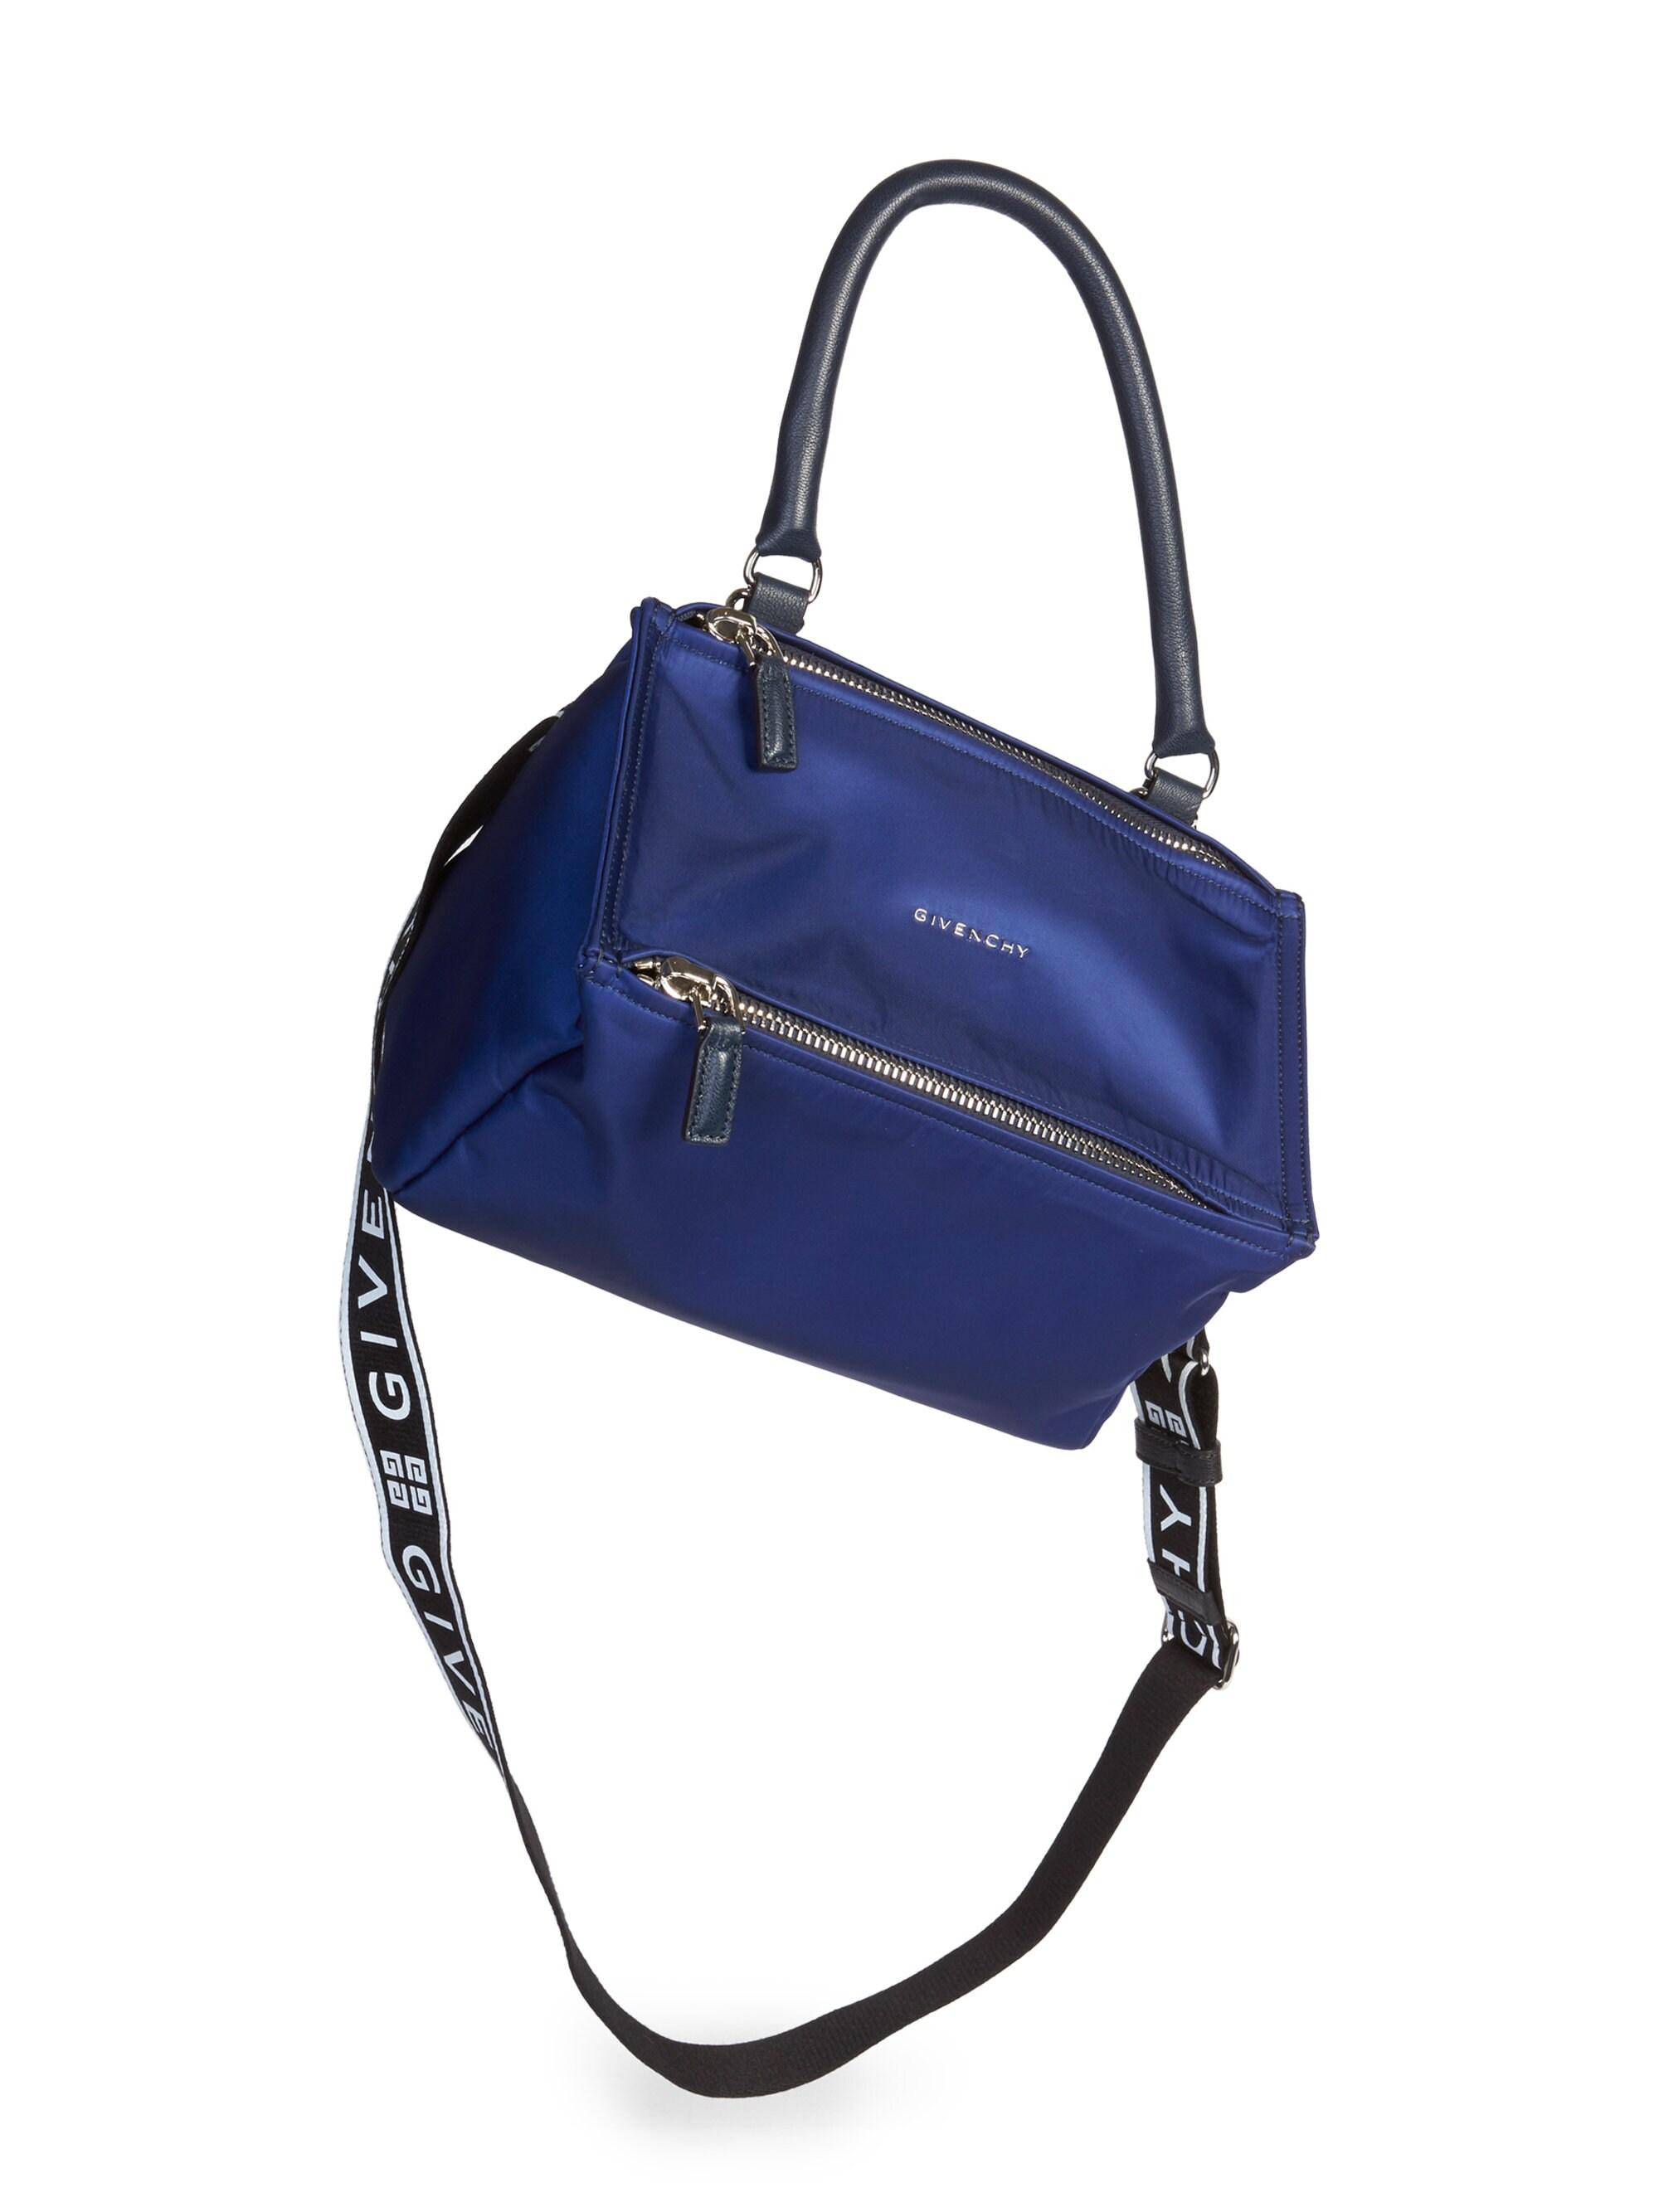 2bc7160607ca1 Givenchy Small Pandora Crossbody Bag in Blue - Lyst